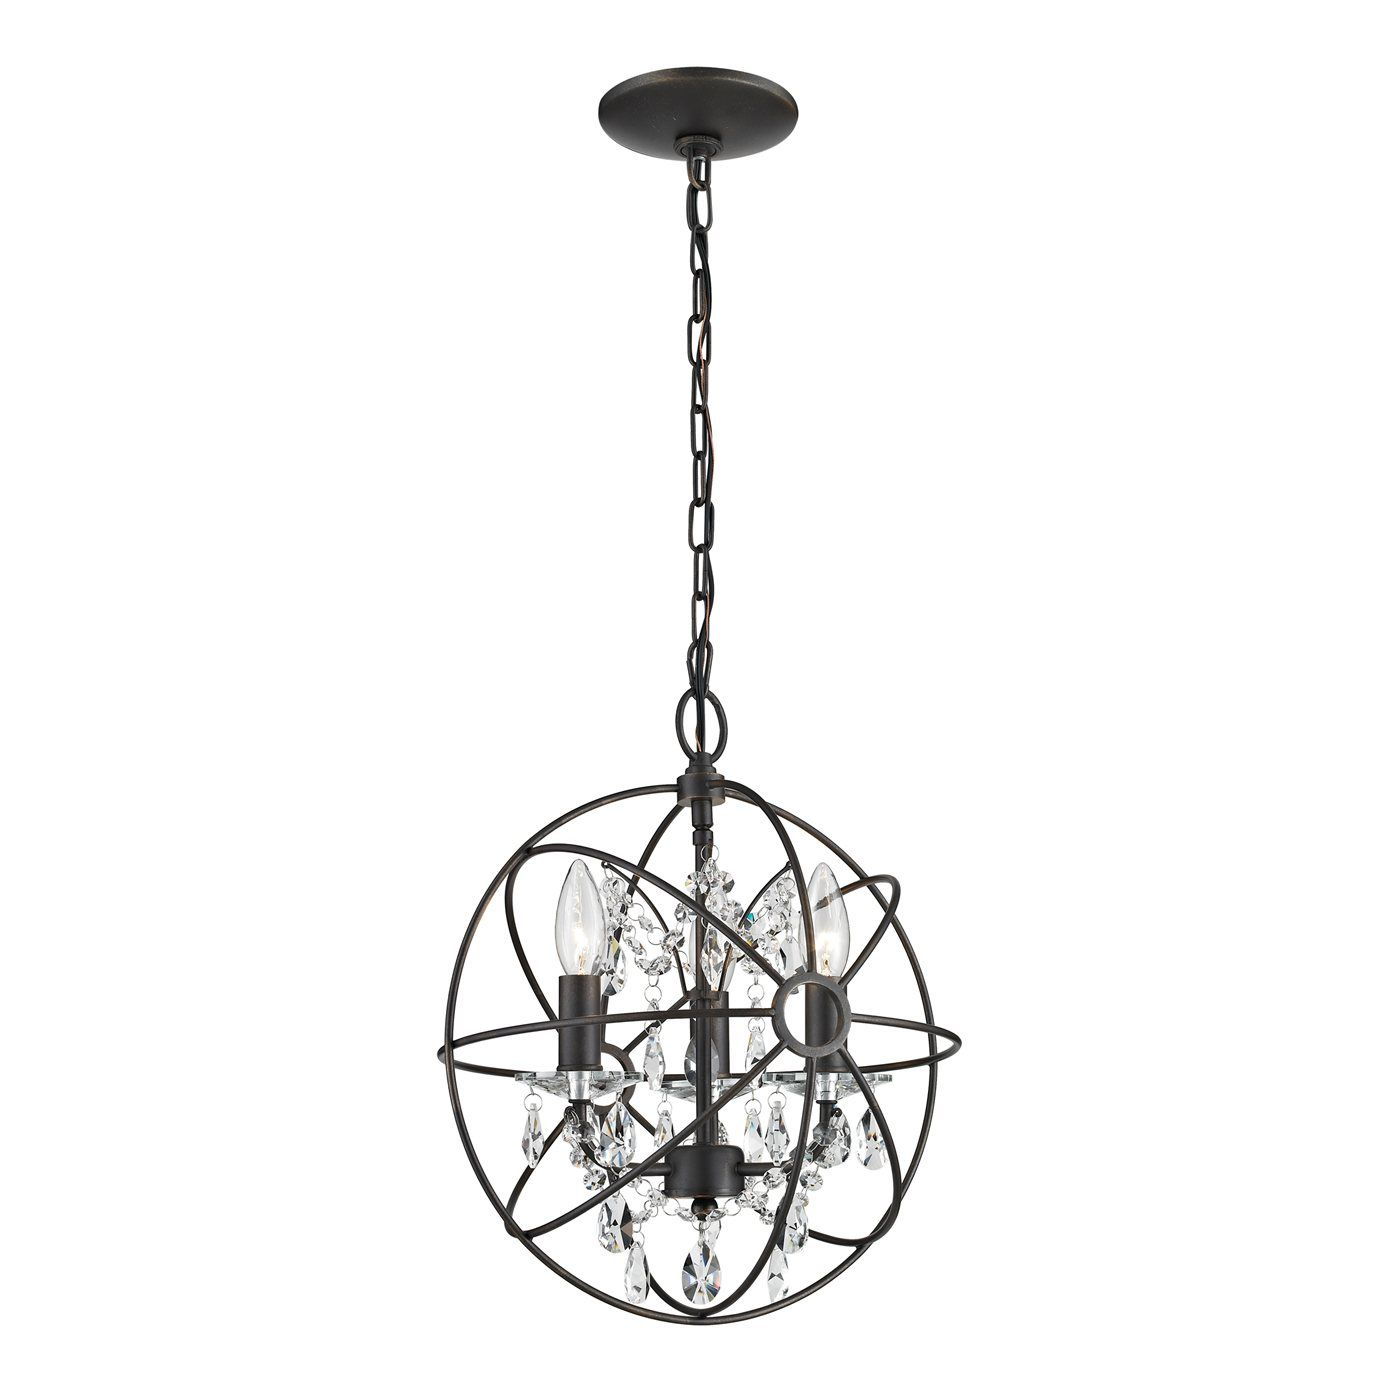 Sterling Industries 124 003 Restoration 3 Light globe chandelier